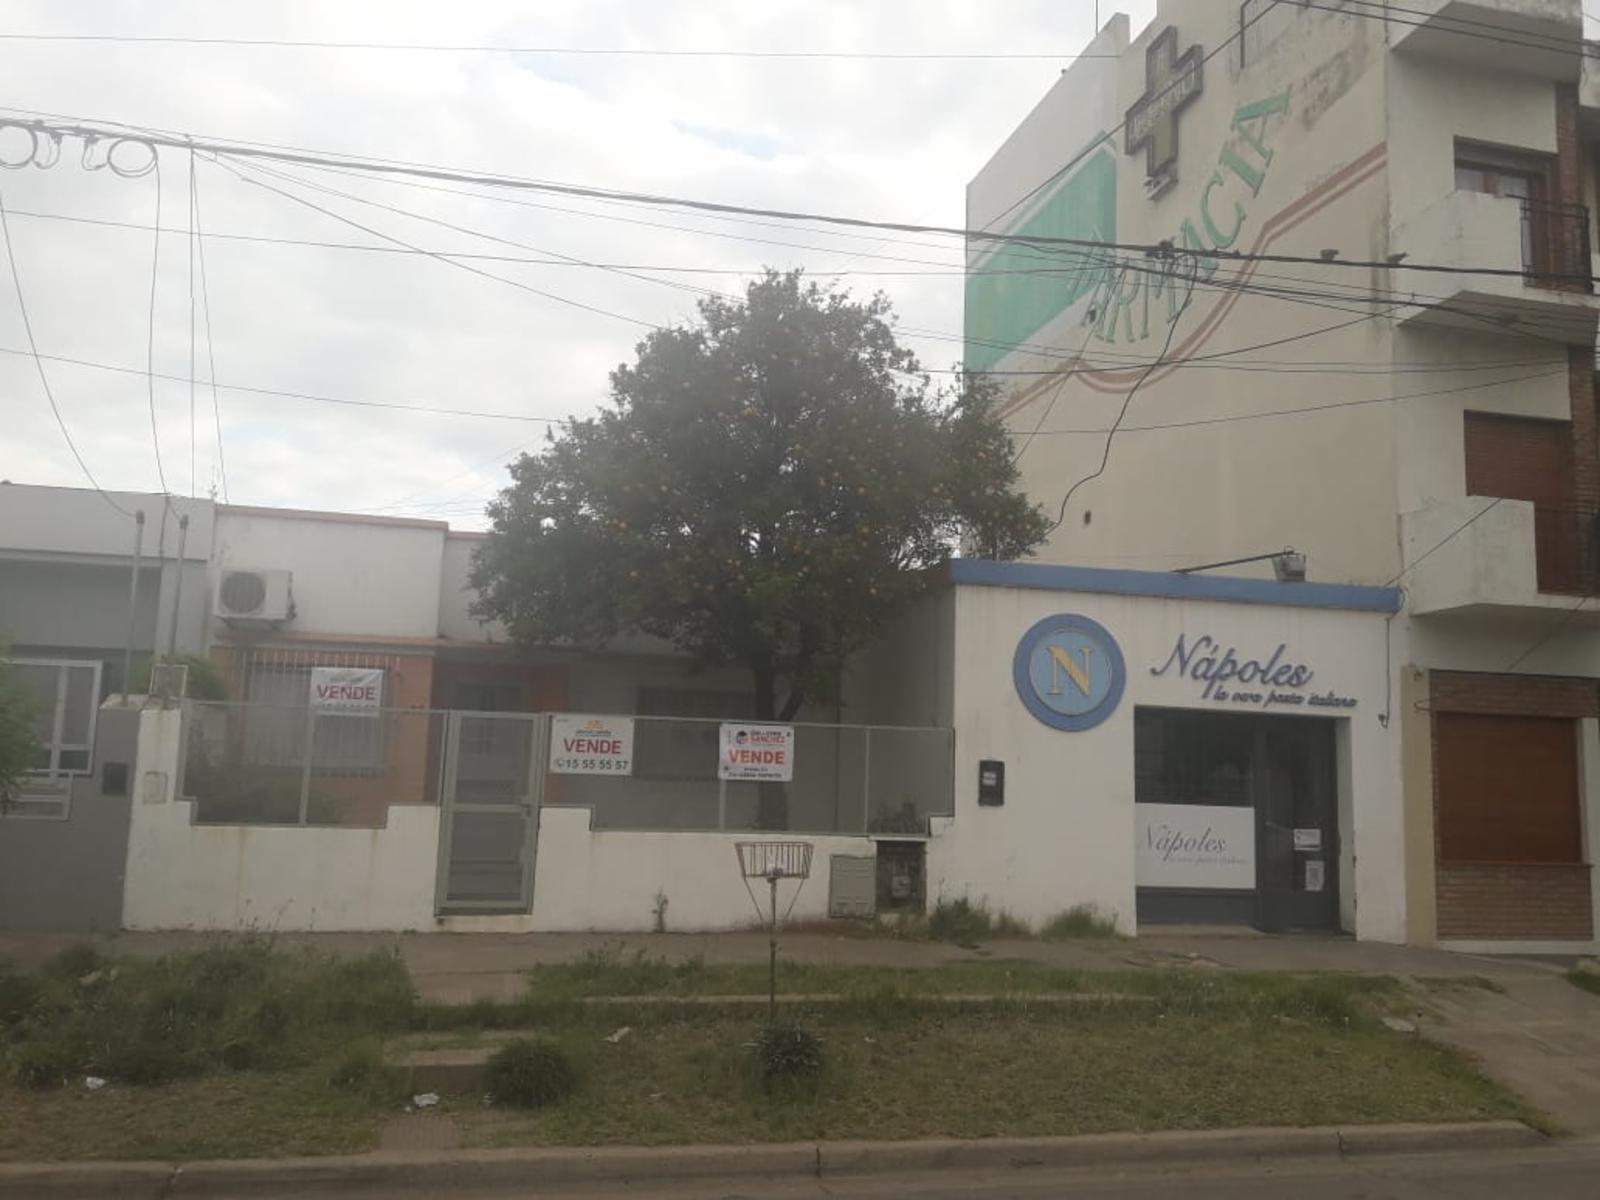 CASA SOBRE AVENIDA ESPAÑA IDEAL COMERCIO, Guillermo Sanchez Desarrollos Inmobiliarios